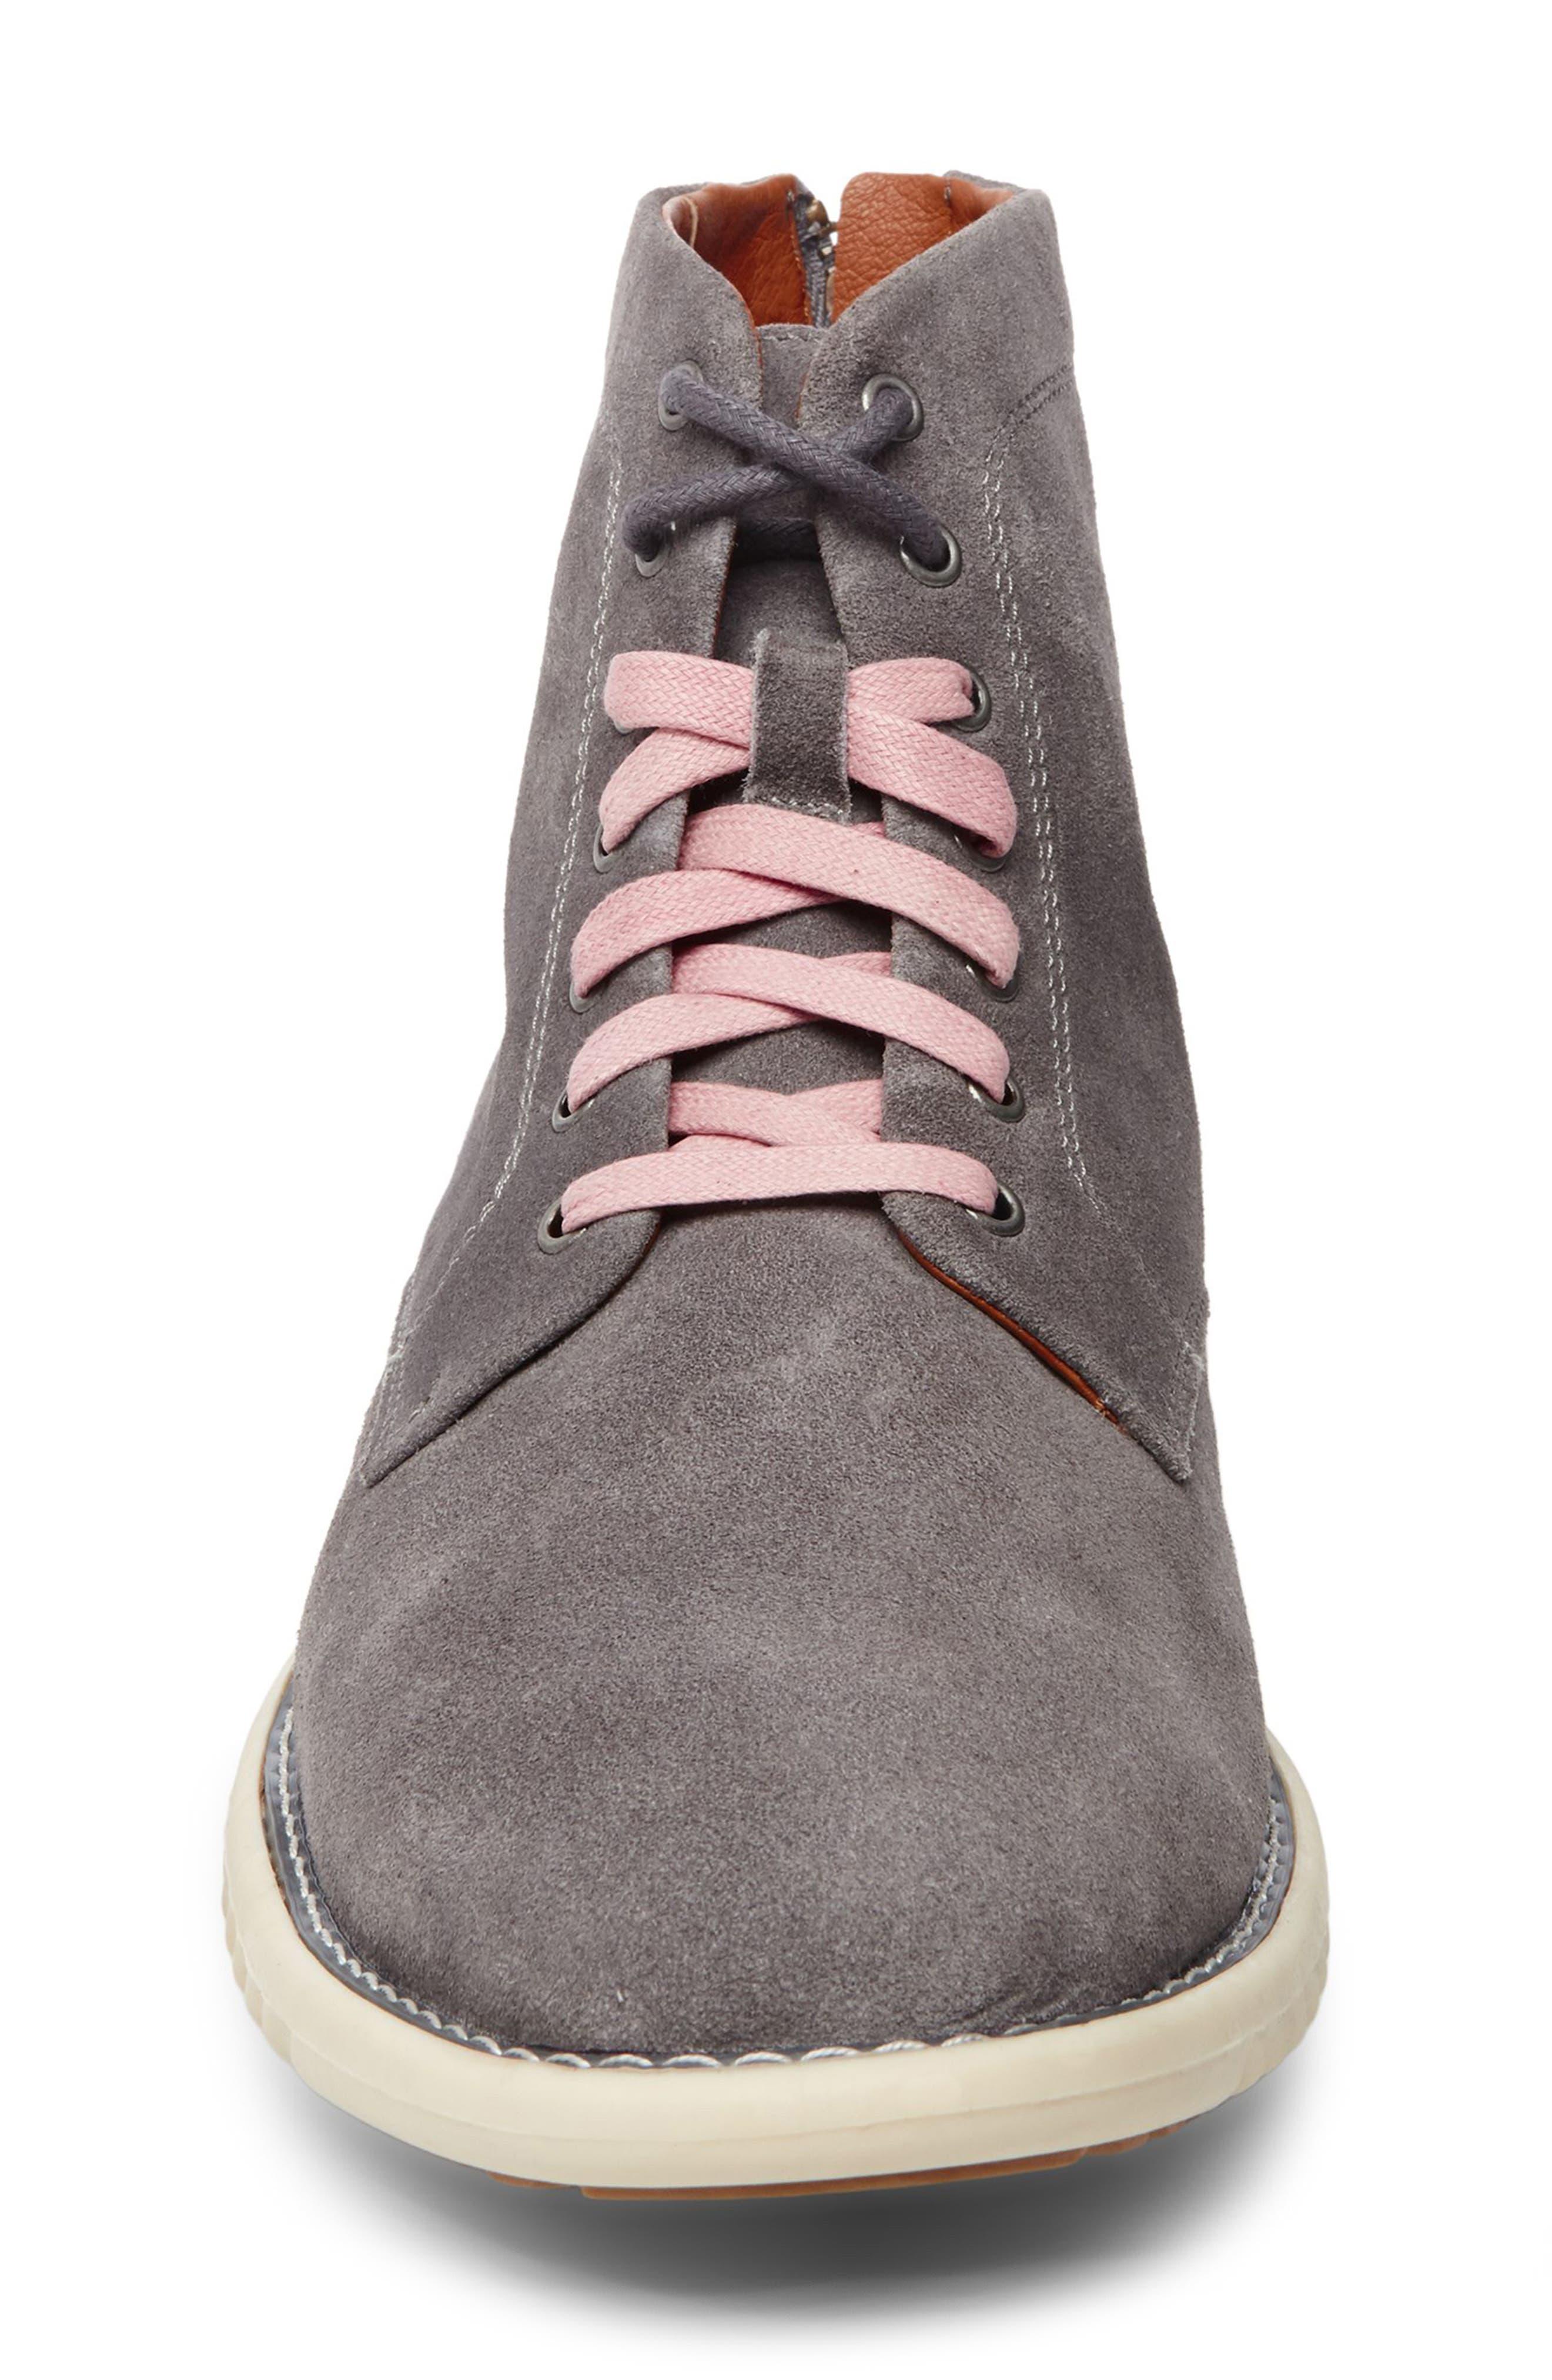 Verner Suede Plain Toe Boot,                             Alternate thumbnail 4, color,                             074